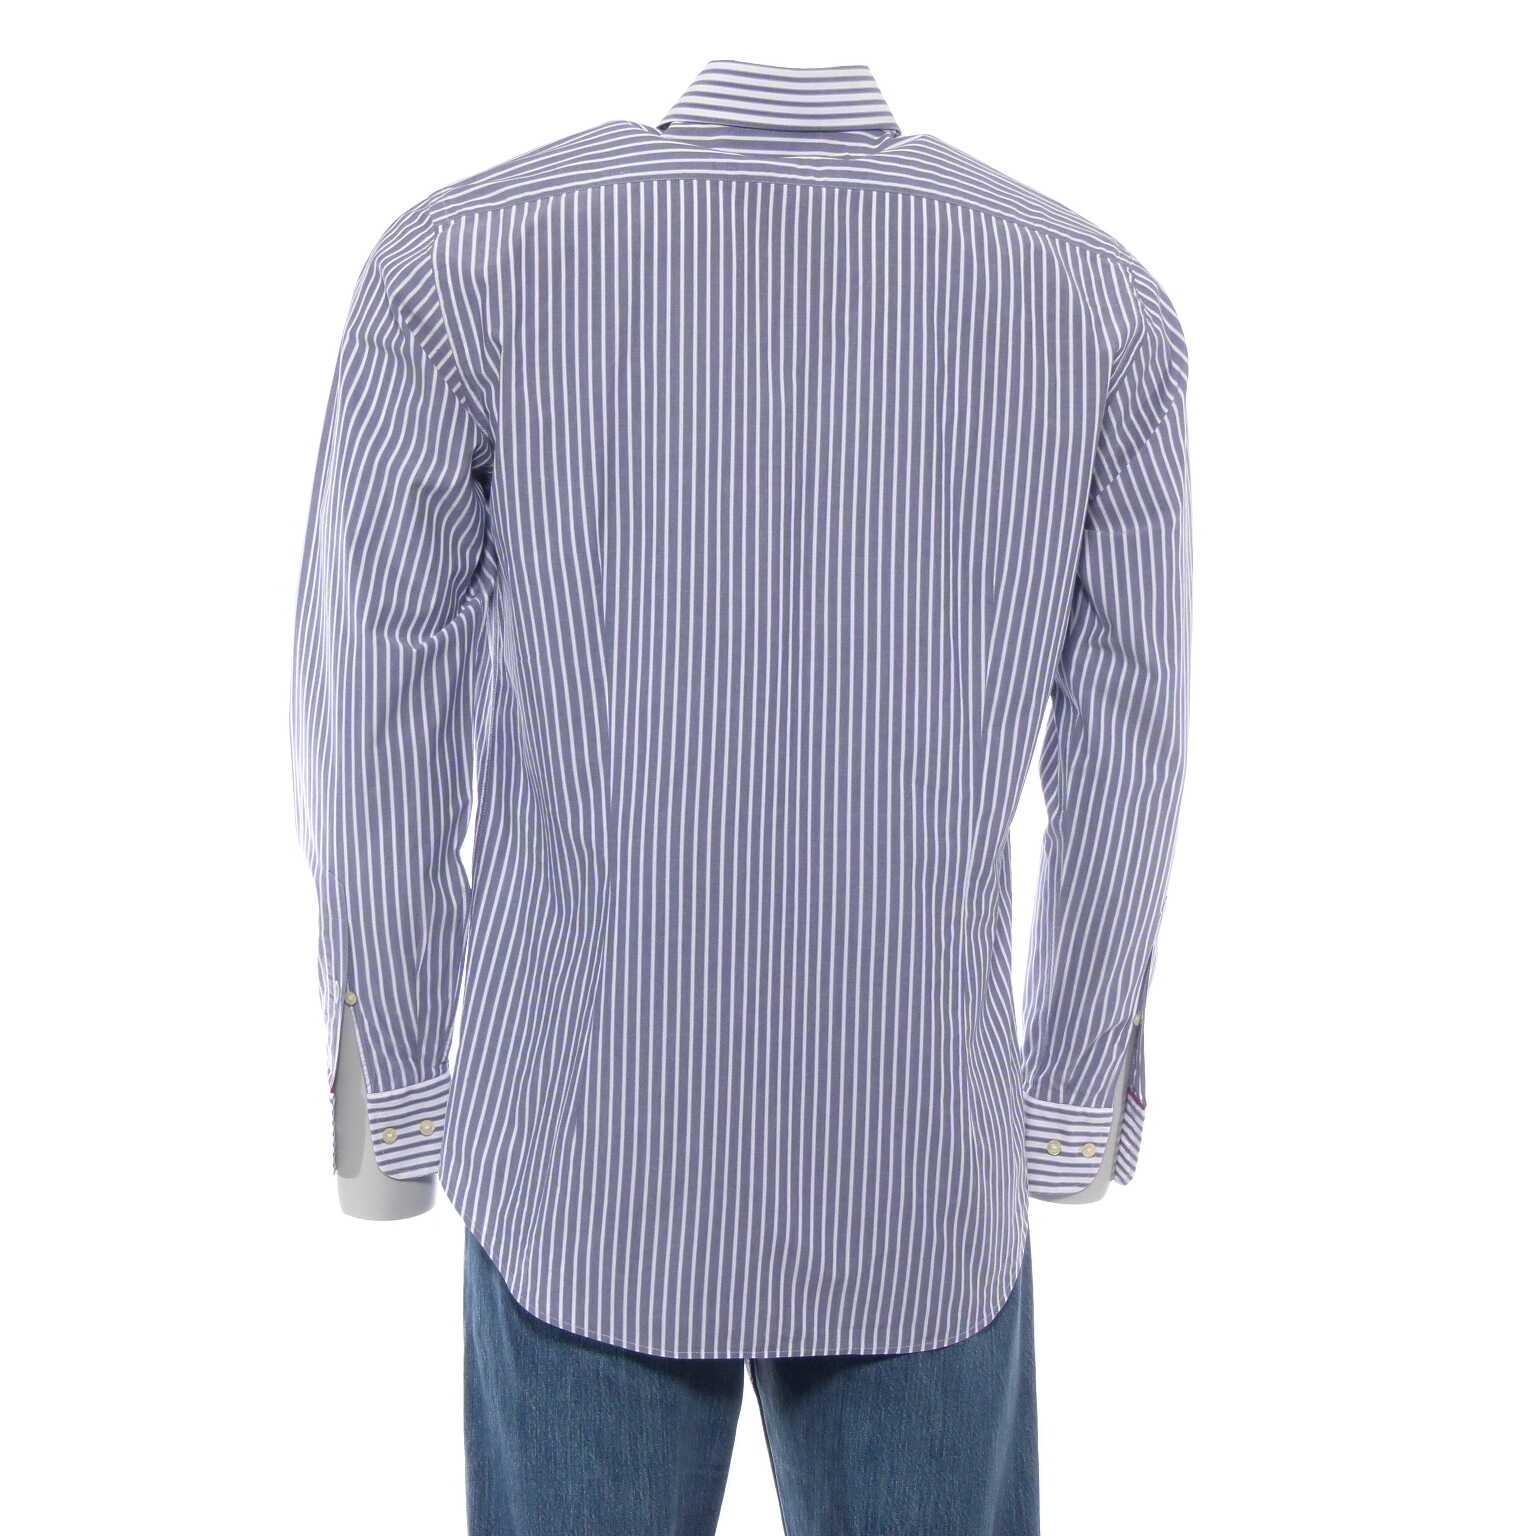 etro hemd gr 41 l blau grau wei gestreift ahb men hemden. Black Bedroom Furniture Sets. Home Design Ideas